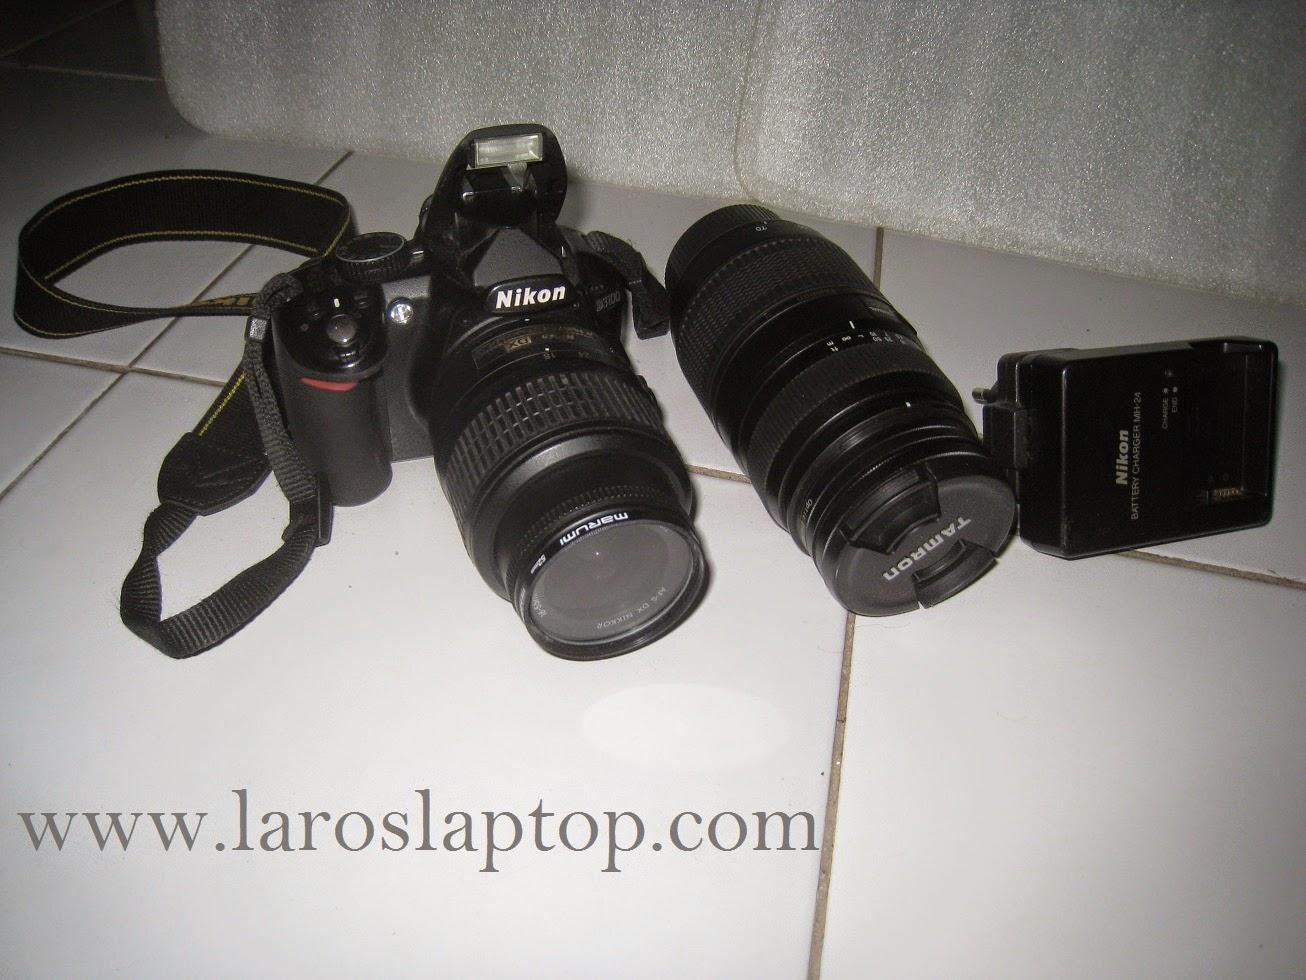 Kamera Bekas Malang NIKON D3100 + Kit + Tamron 70-300mm f4-5.6 Di LD NIKON